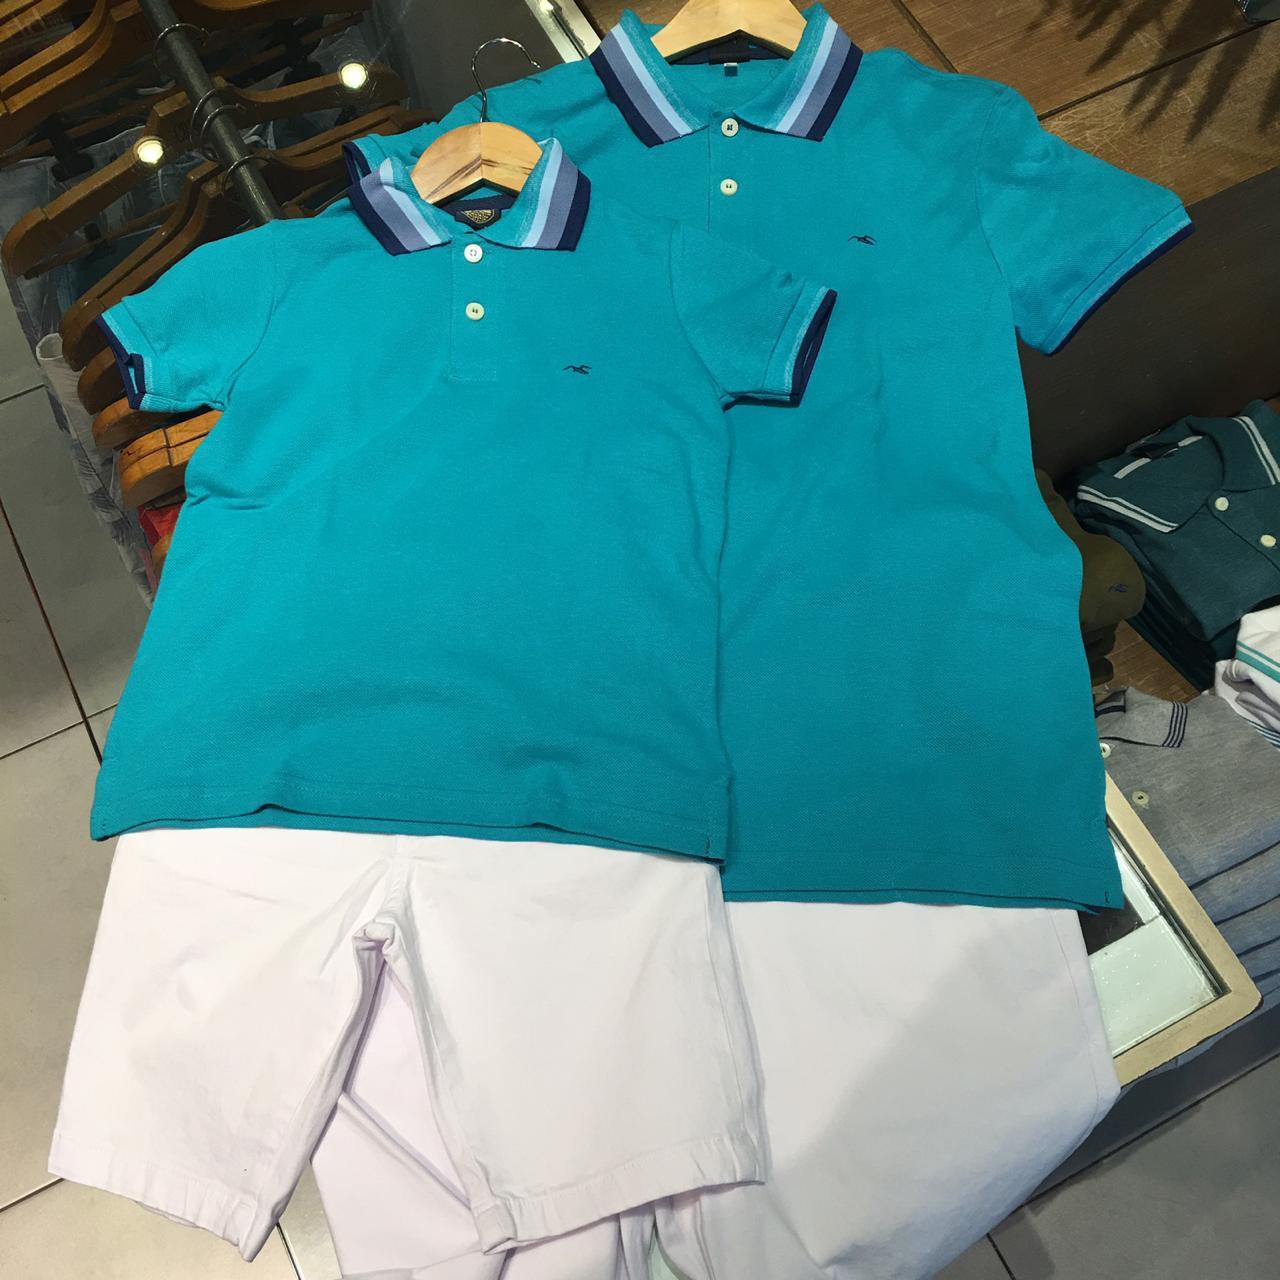 Bermuda Adulto (R$ 185) Polo Adulto (R$ 99) - Zip Náutica - Shopping da Bahia